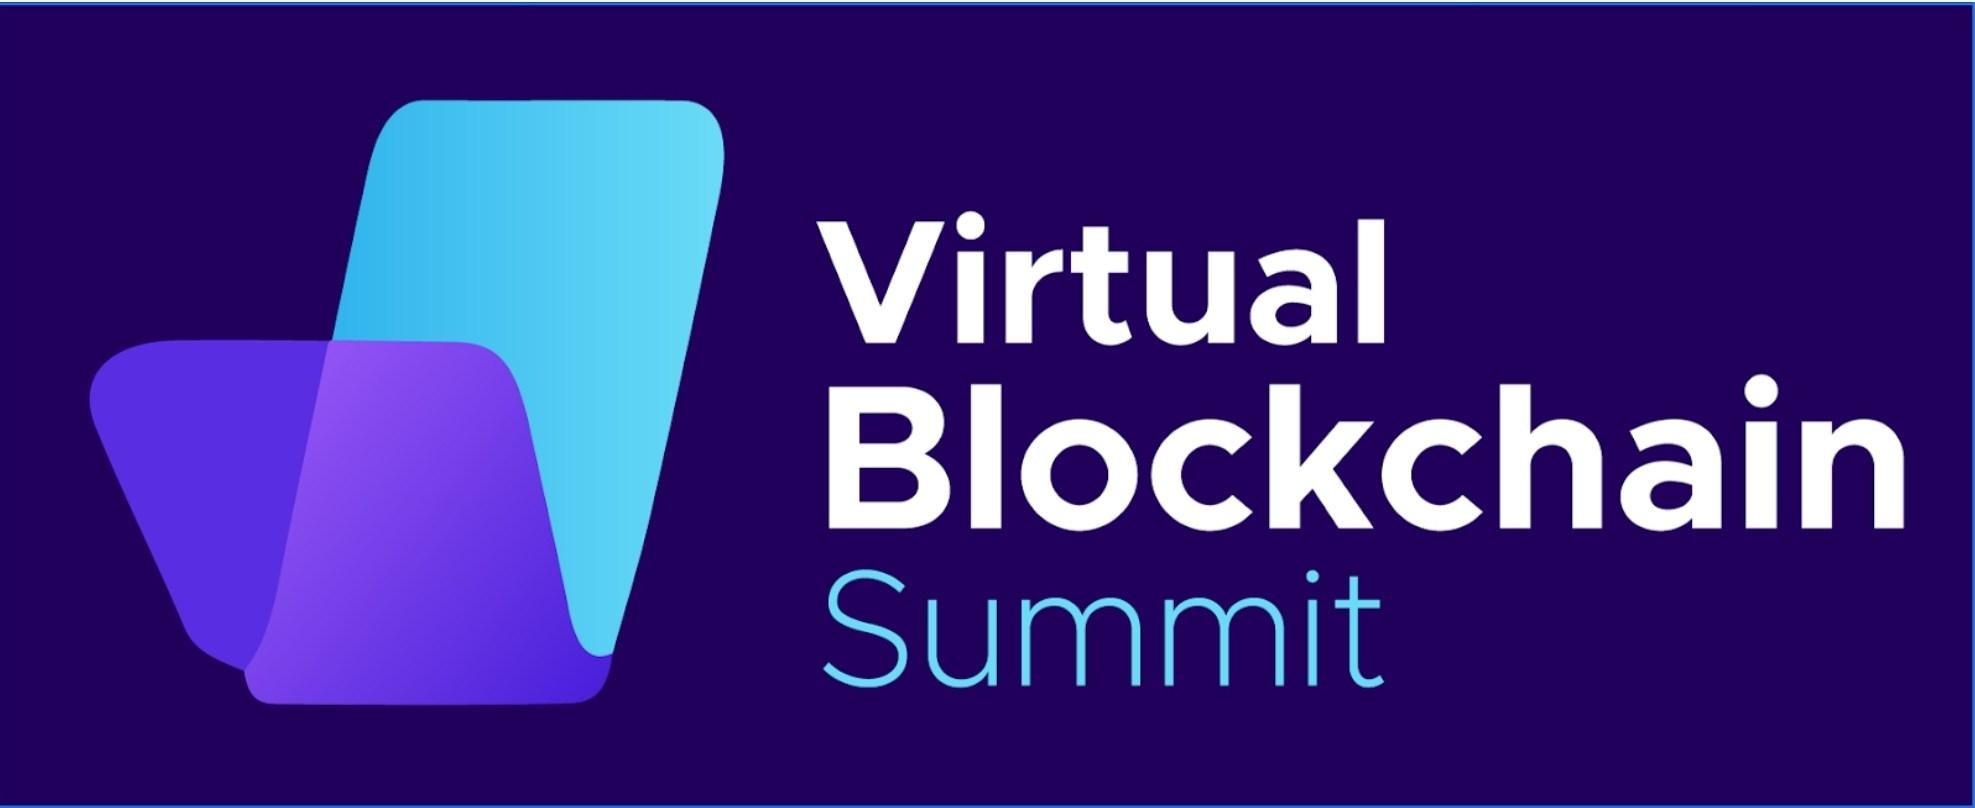 CryptoCoin.Pro Implements Blockchain Technology in its Virtual Blockchain Summit 2020